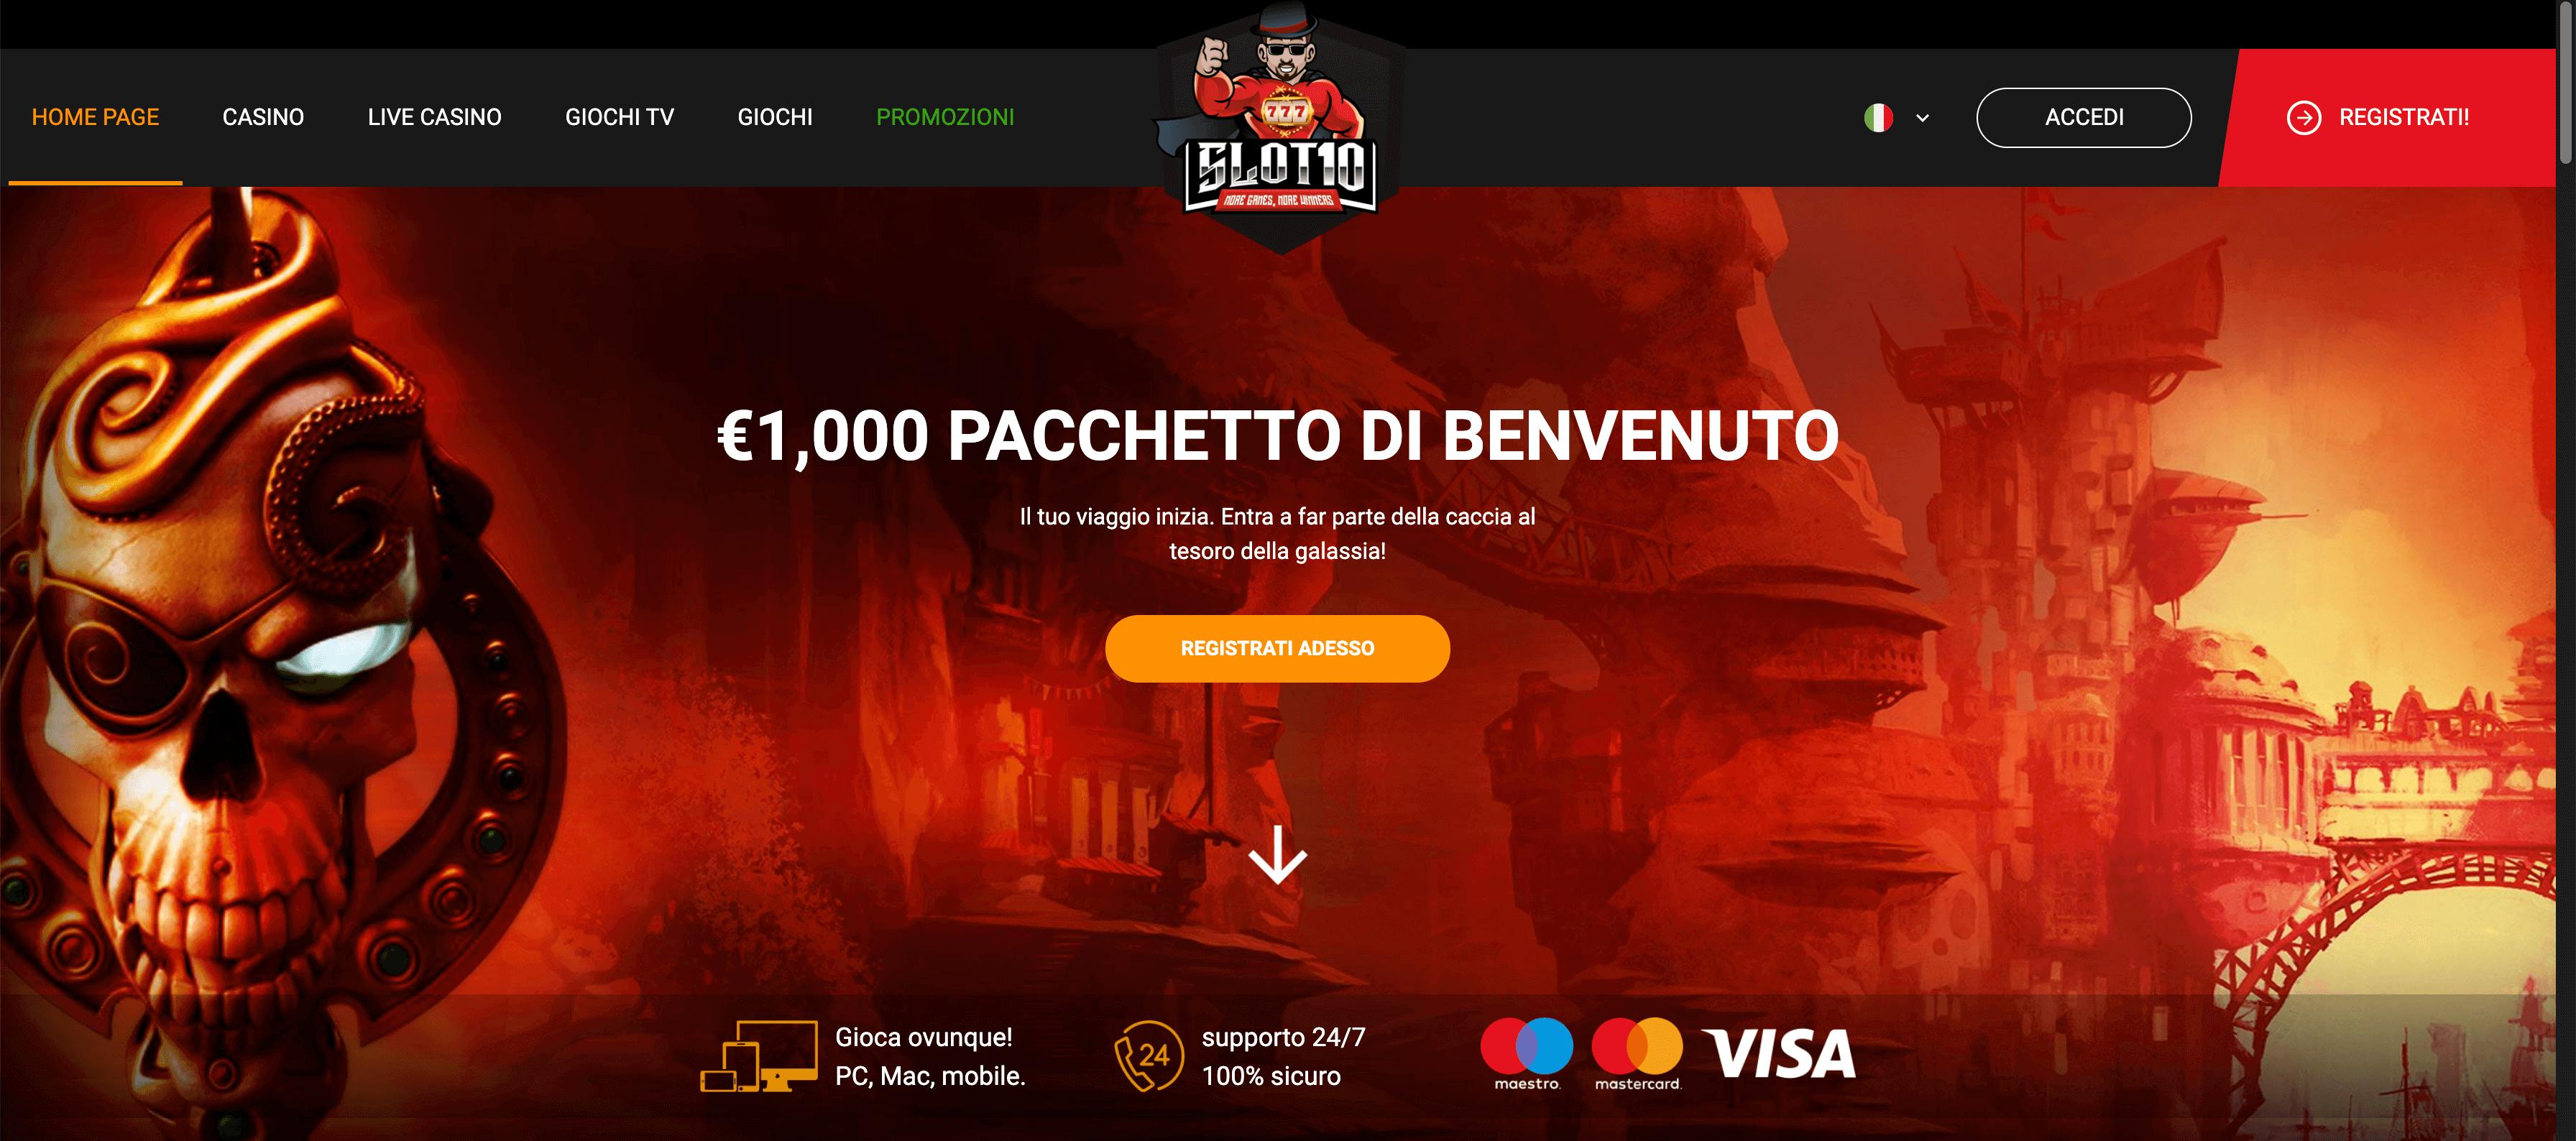 slot10 homepage